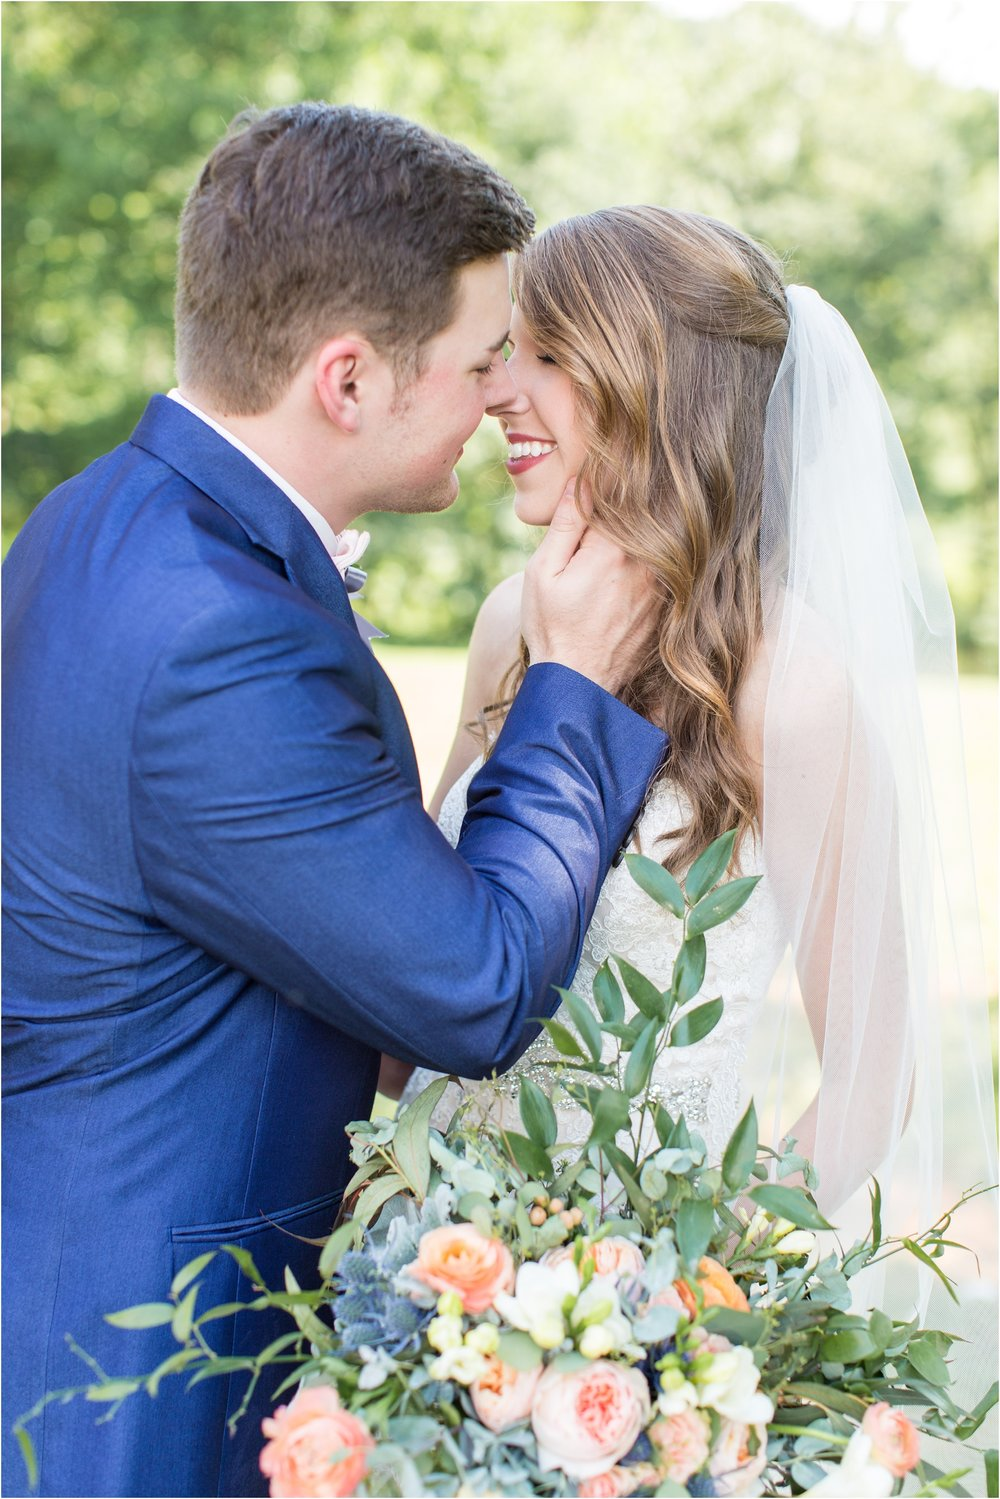 Savannah Eve Photography- Phillips Wedding- Blog-36.jpg